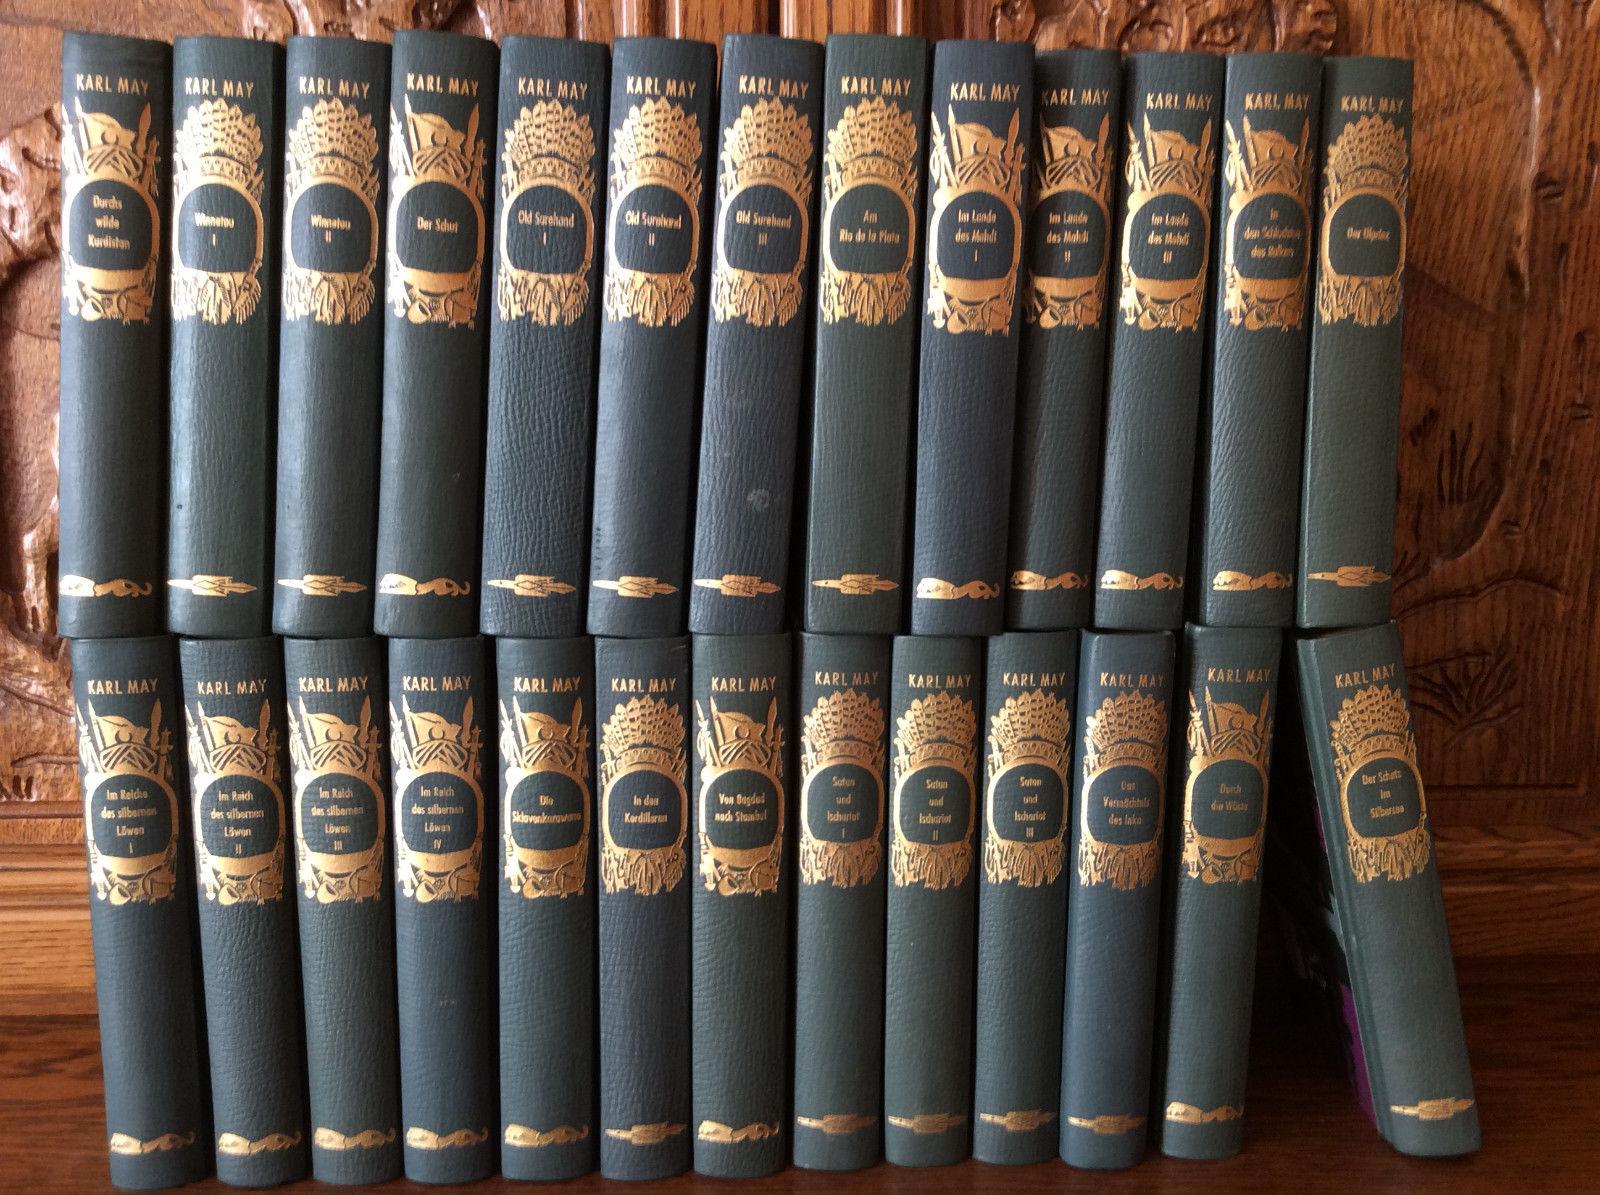 Karl May - 26 Stück - Bücher Sammlung Konvolut Paket Winnetou Old Surehand